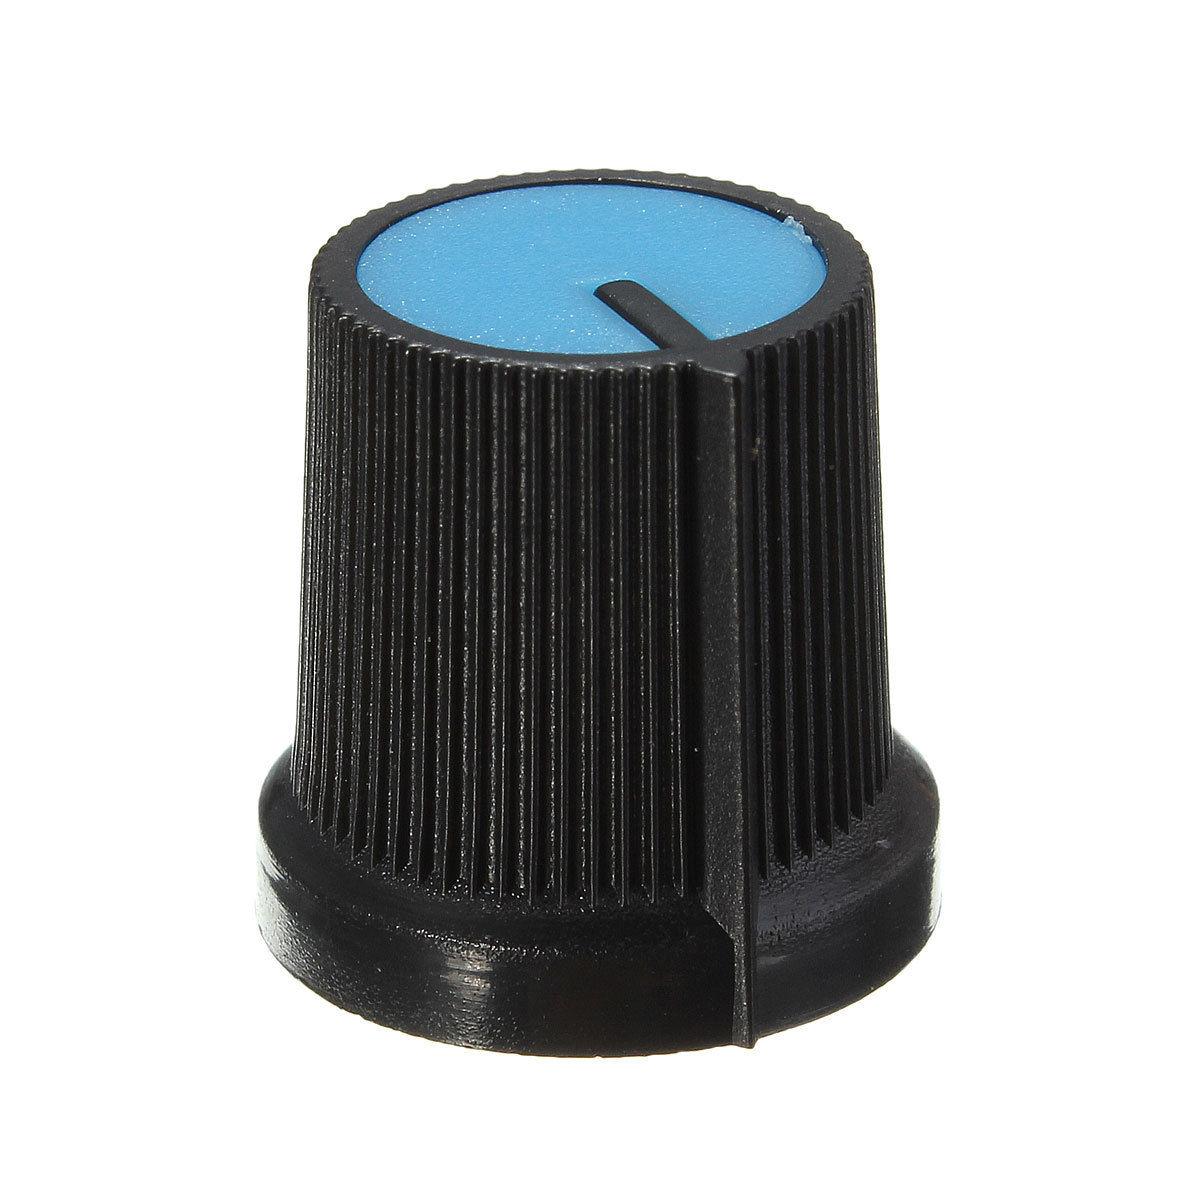 10PCS Black Knob Blue Face Plastic for Rotary Taper Potentiometer Hole 6mm CA